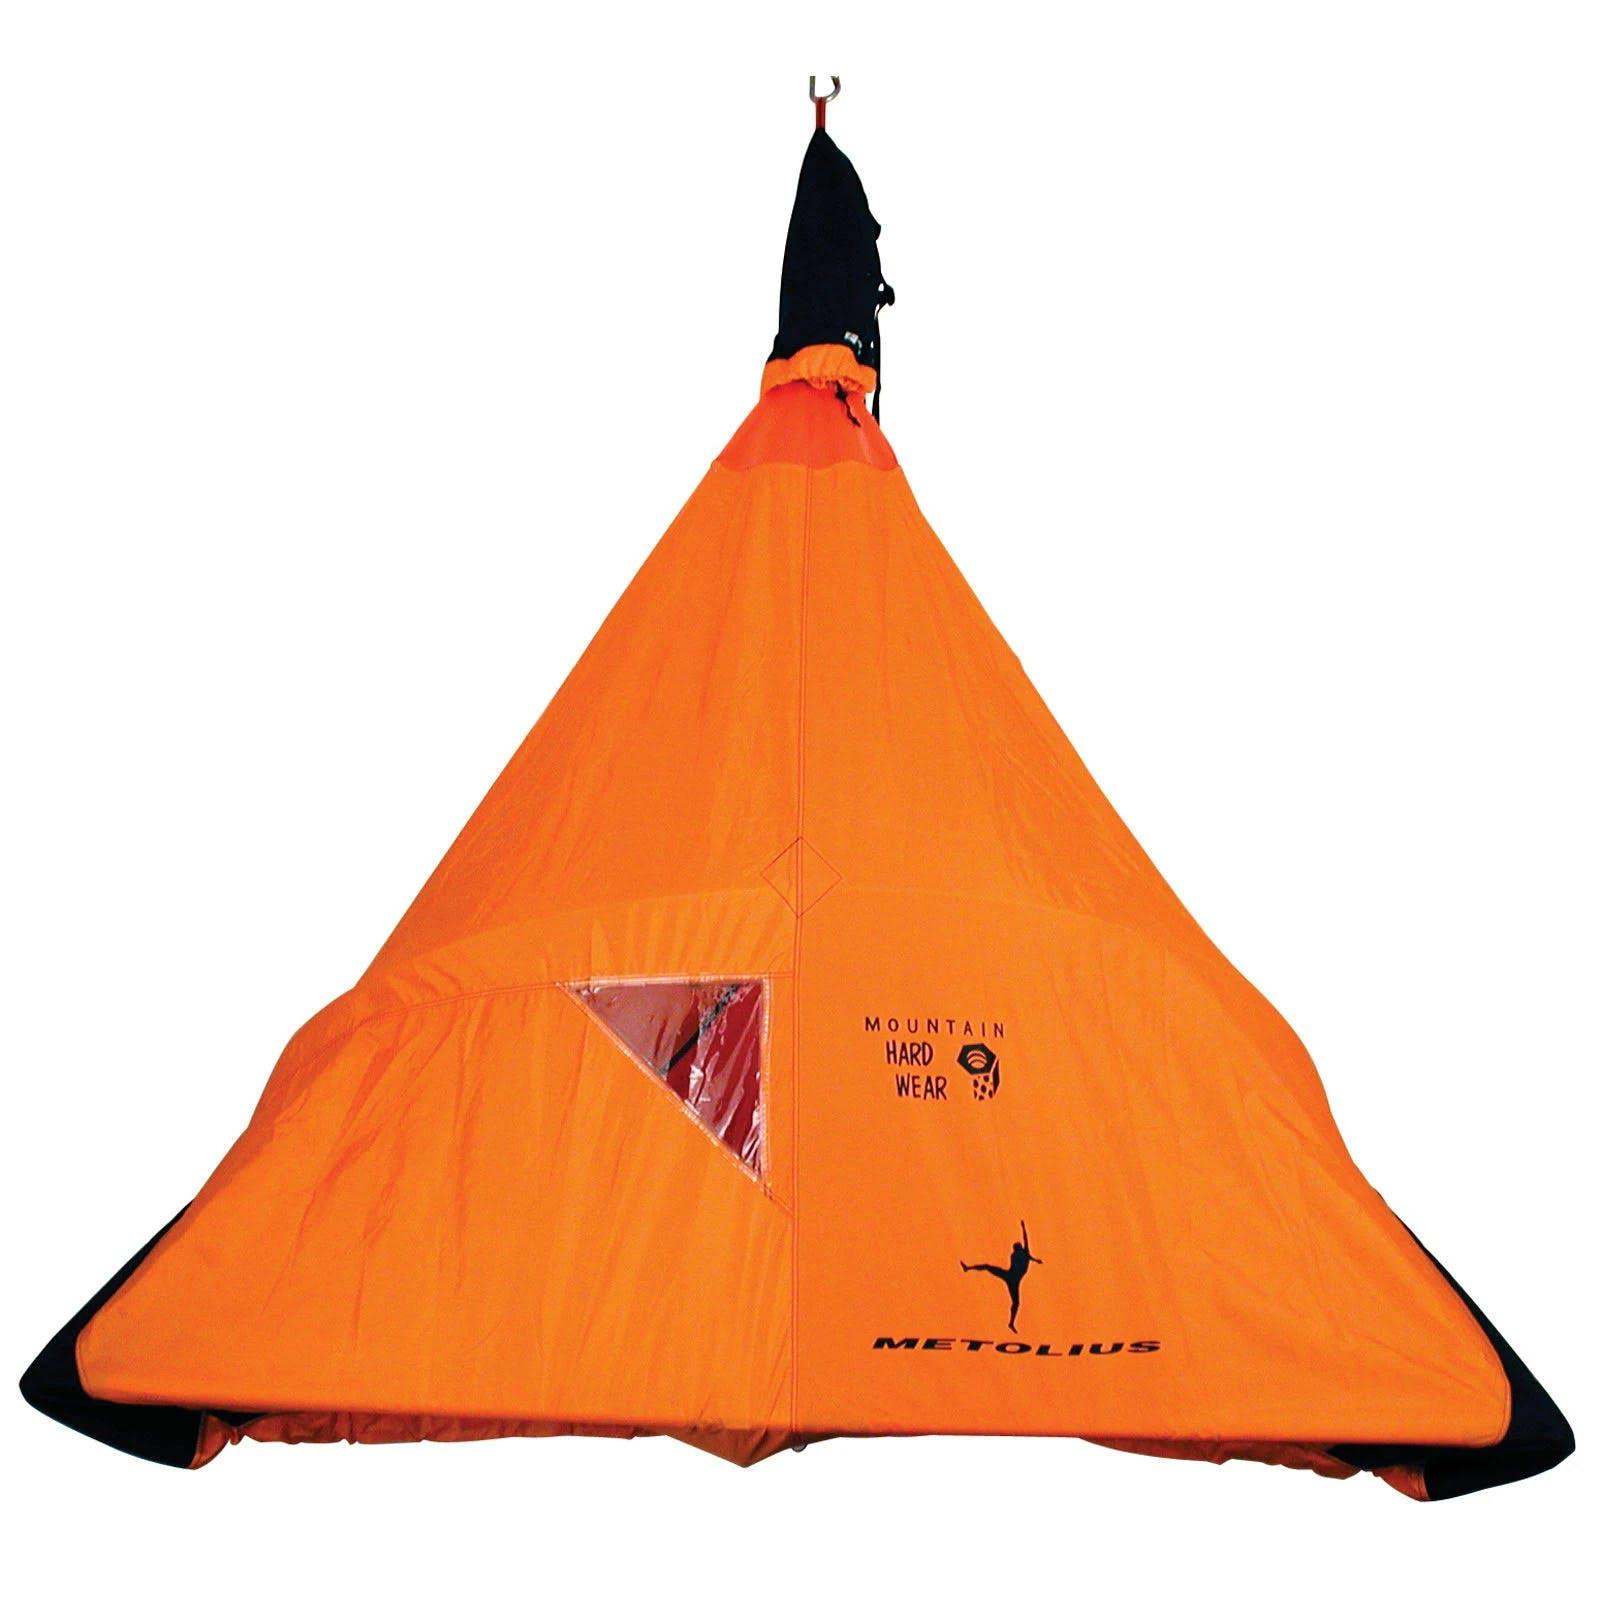 Metolius Bomb Shelter Fly - Orange - Double